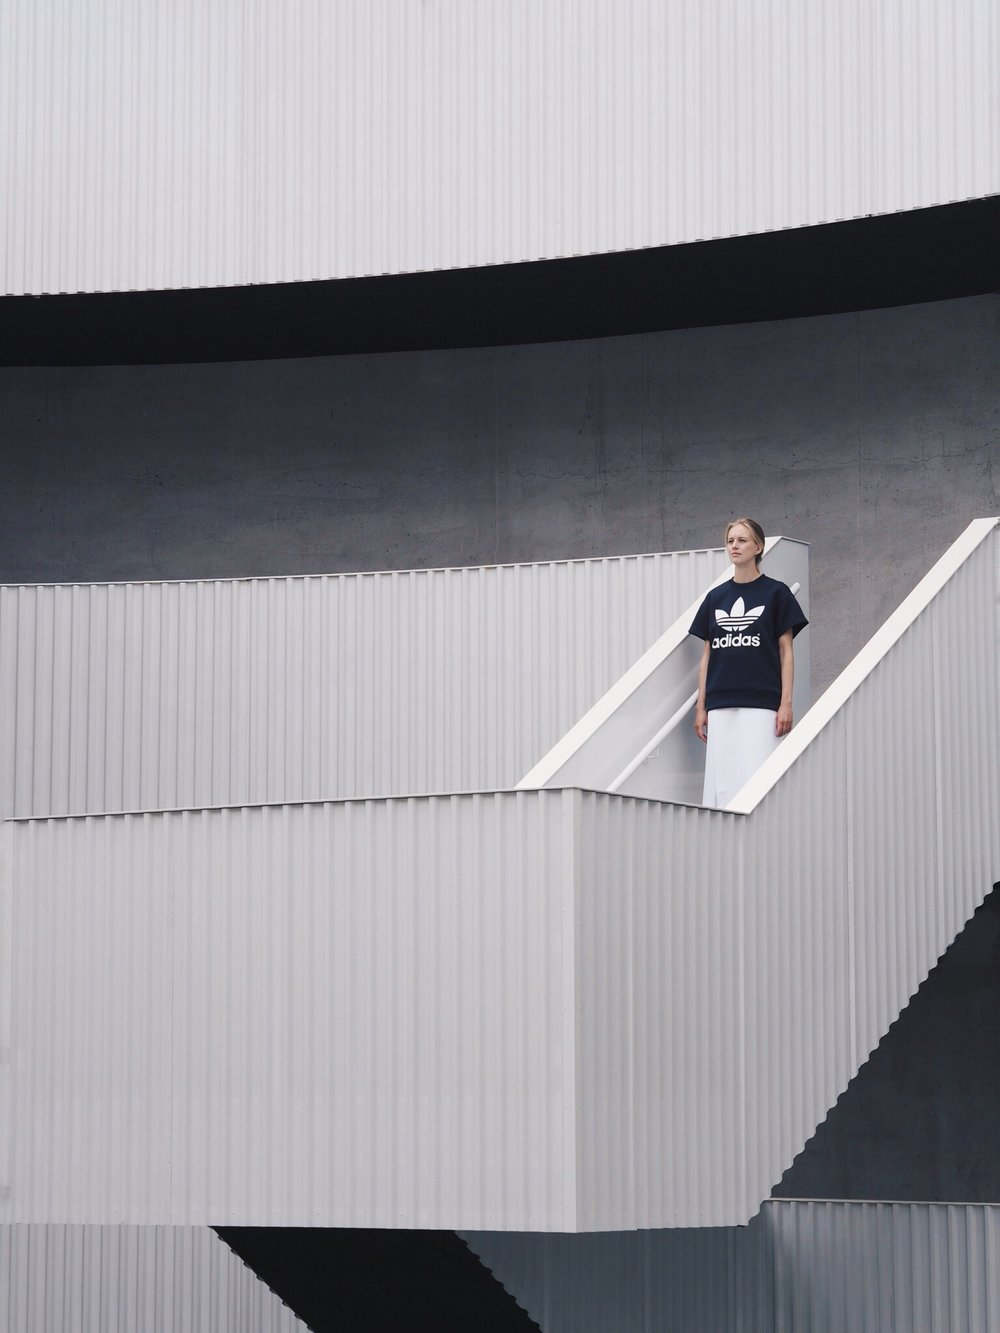 Adidas_NanaHagel.JPG